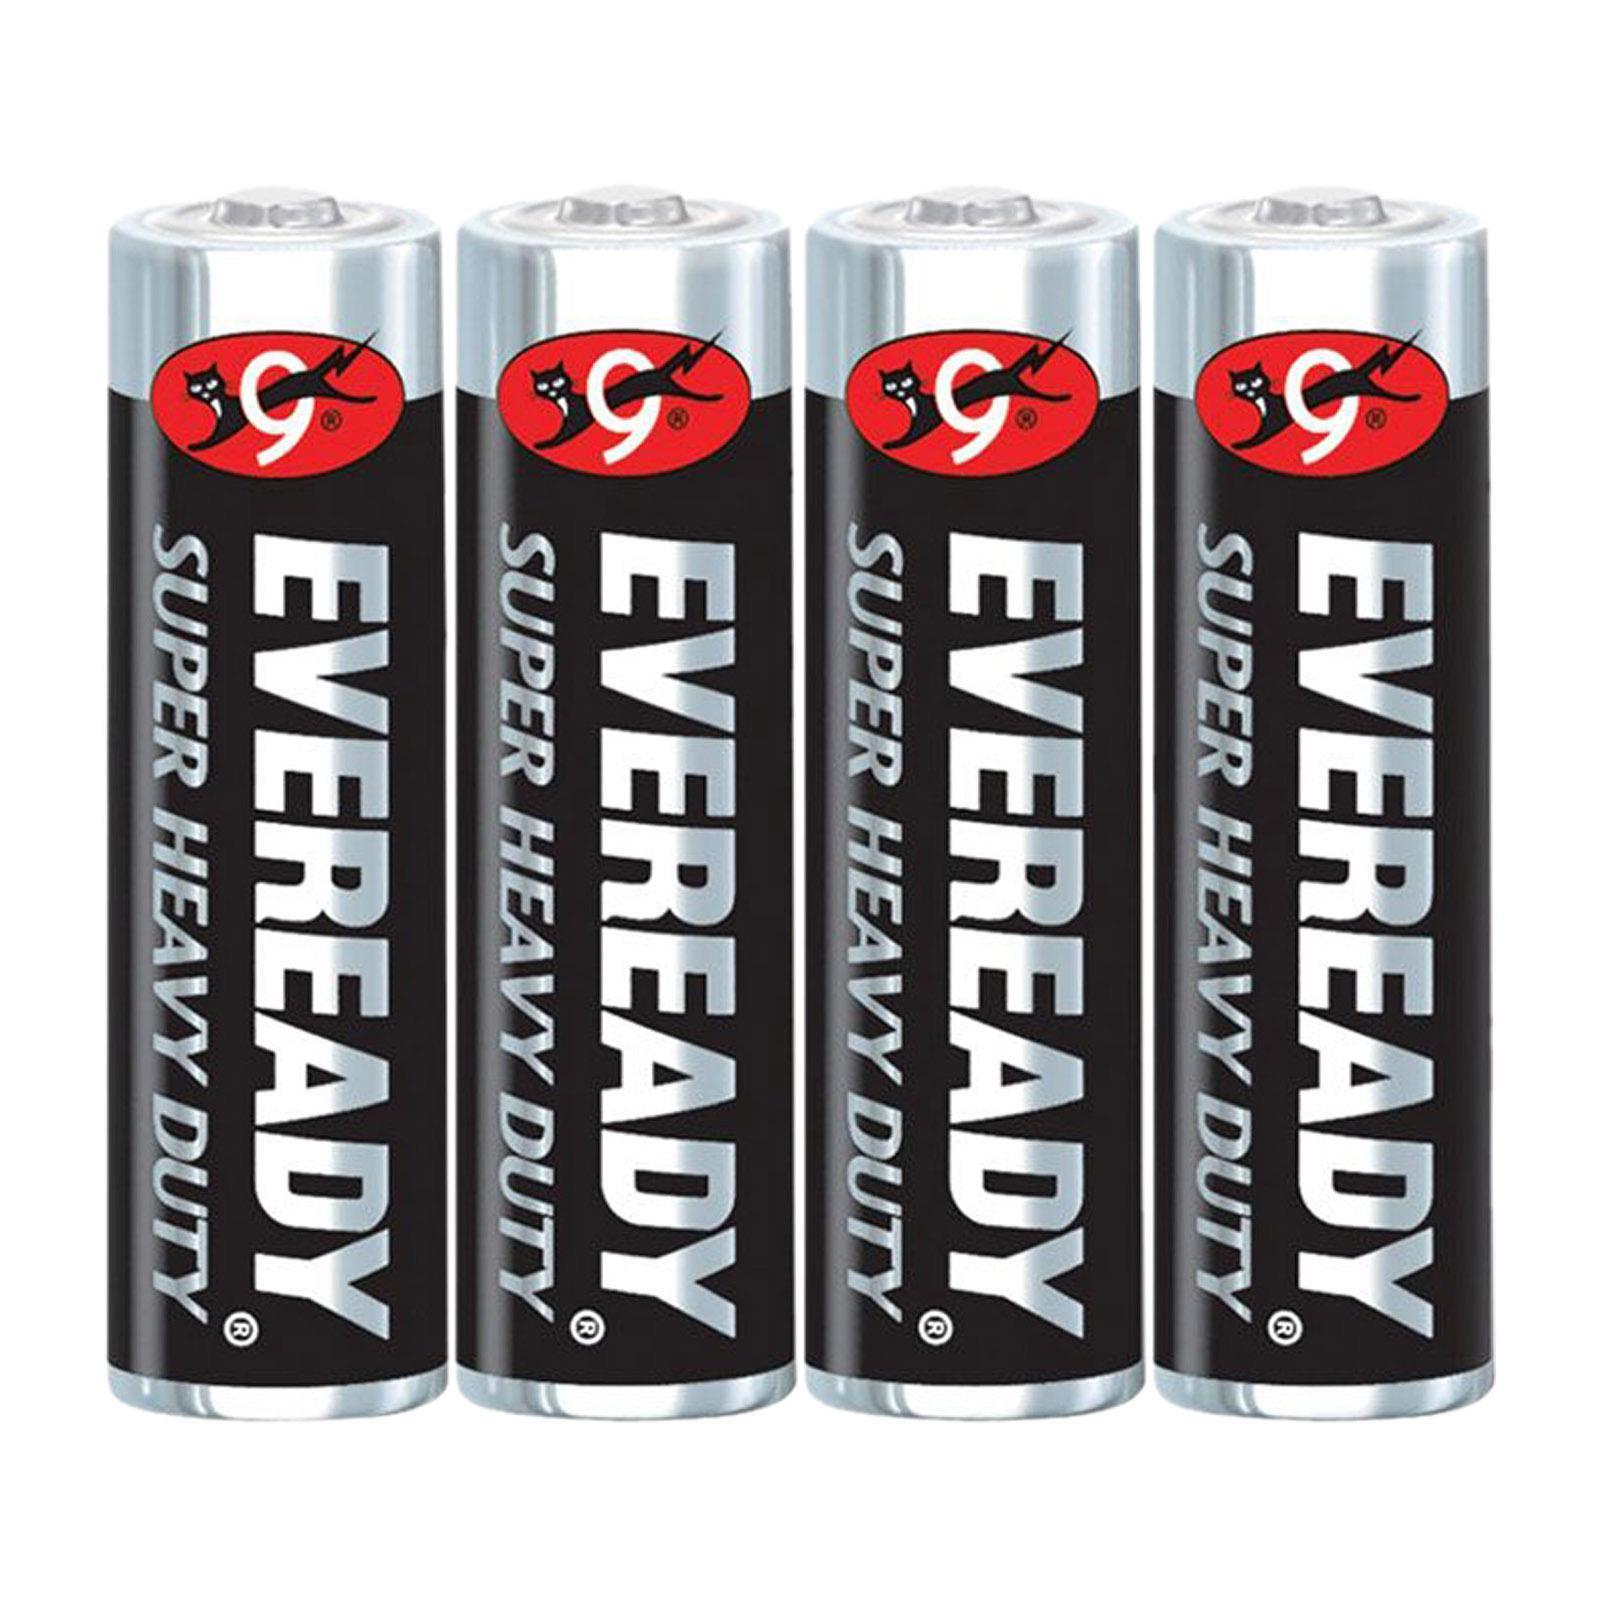 Eveready M1212 Sw4 Carbon Zinc Battery Super Heavy Duty Size:Aaa (4Pcs/Pack)